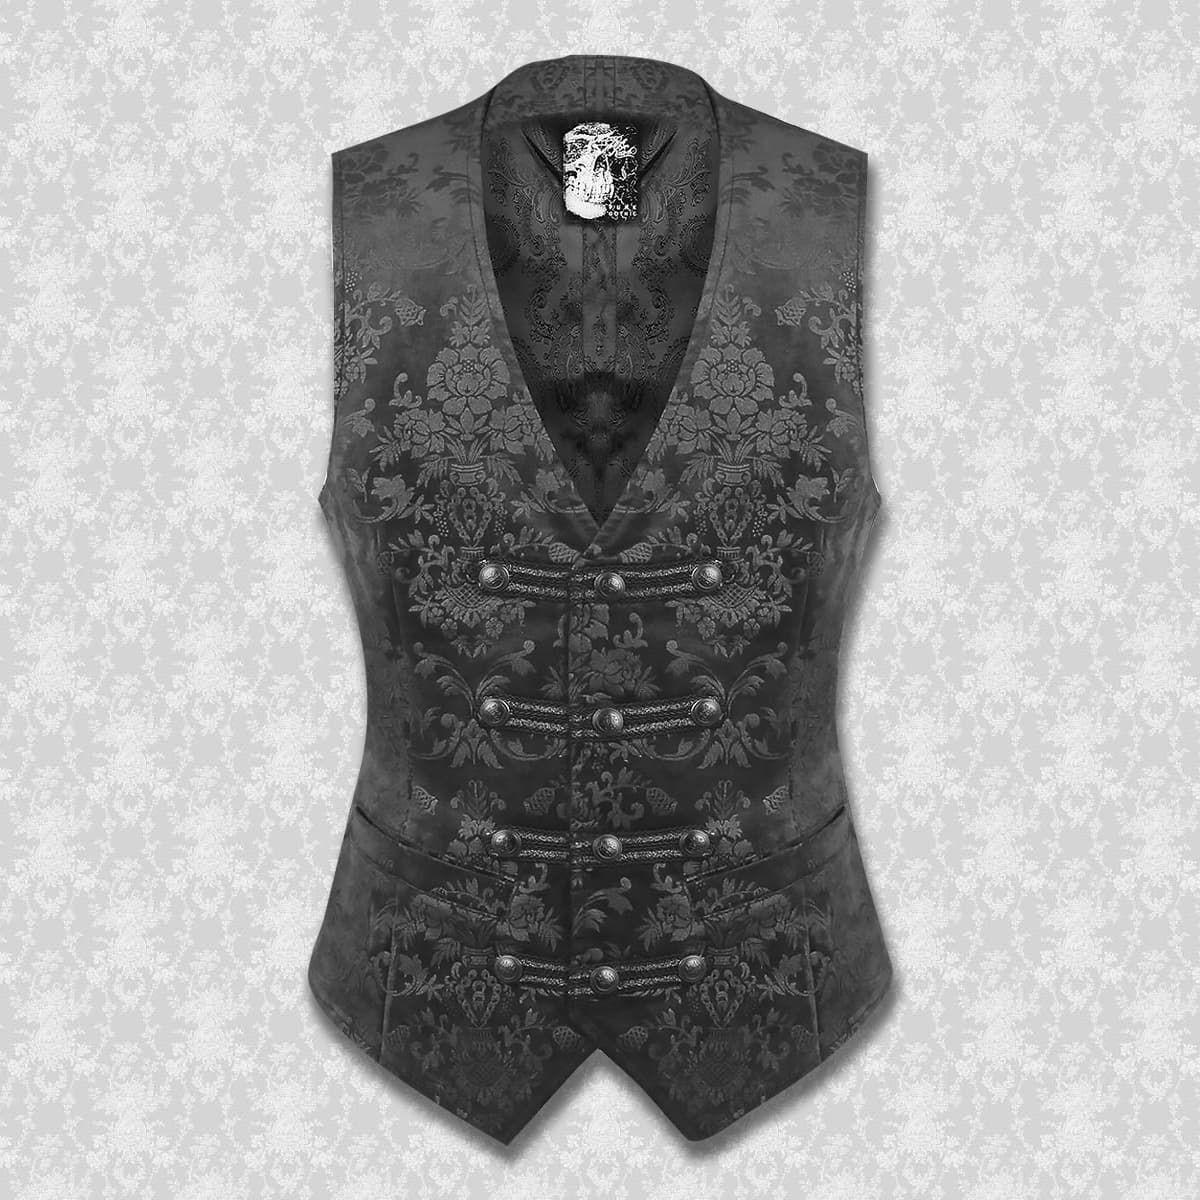 Dorian Black on Black Brocade Vest